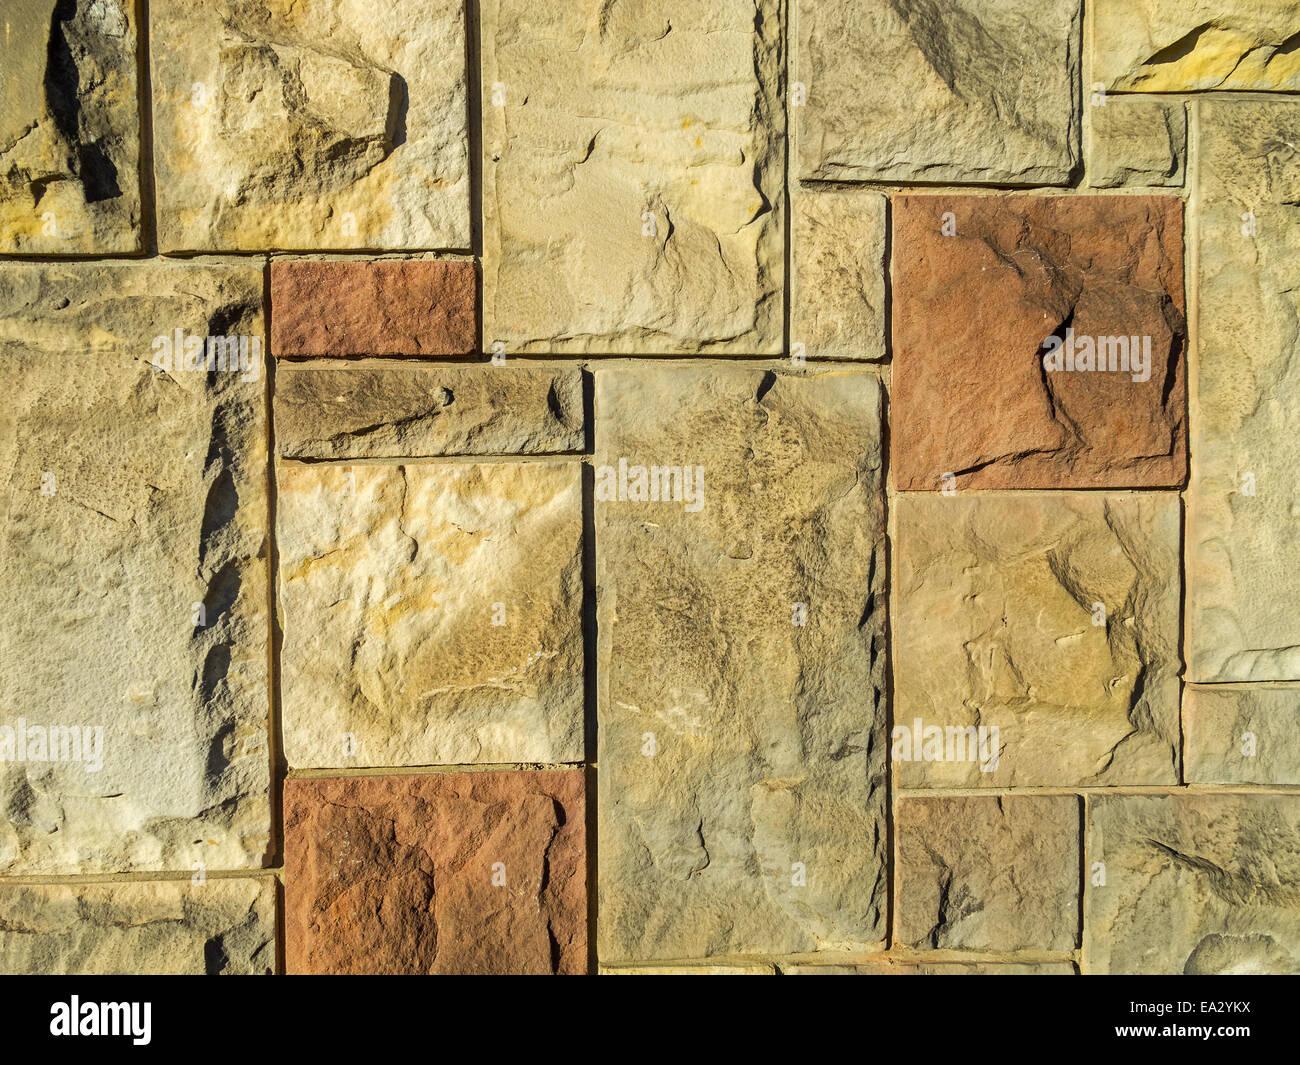 Gray Block Wall Stock Photos & Gray Block Wall Stock Images - Alamy